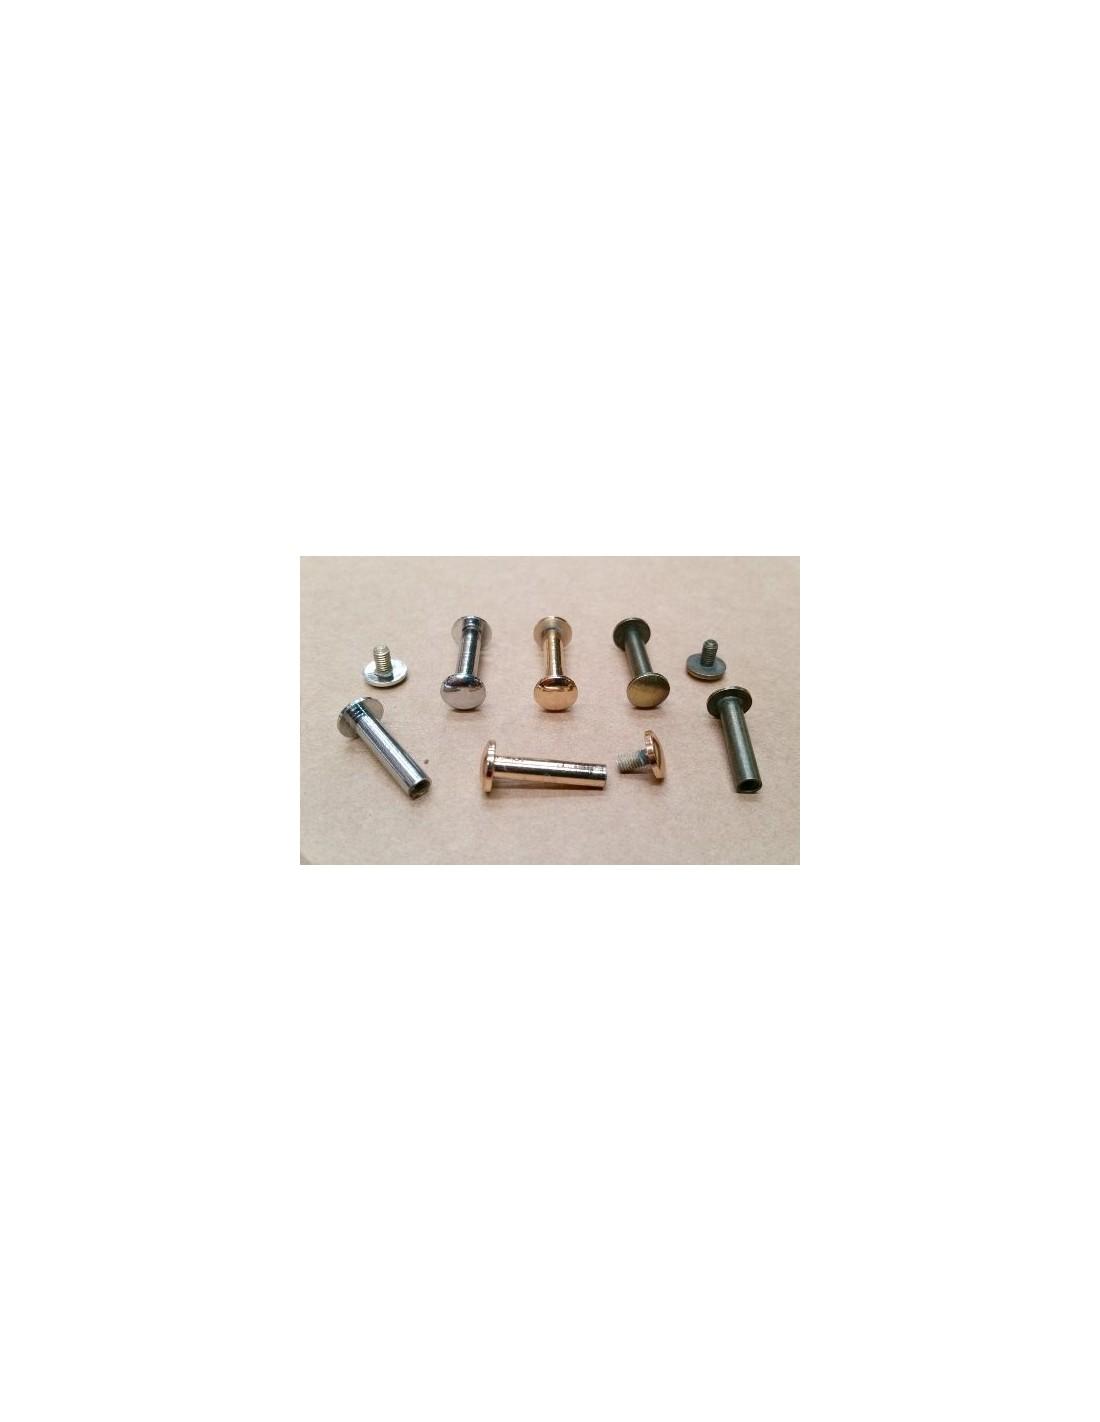 Remache encuadernaci n cabeza 8 mm largo 20mm productos for Remaches de hierro